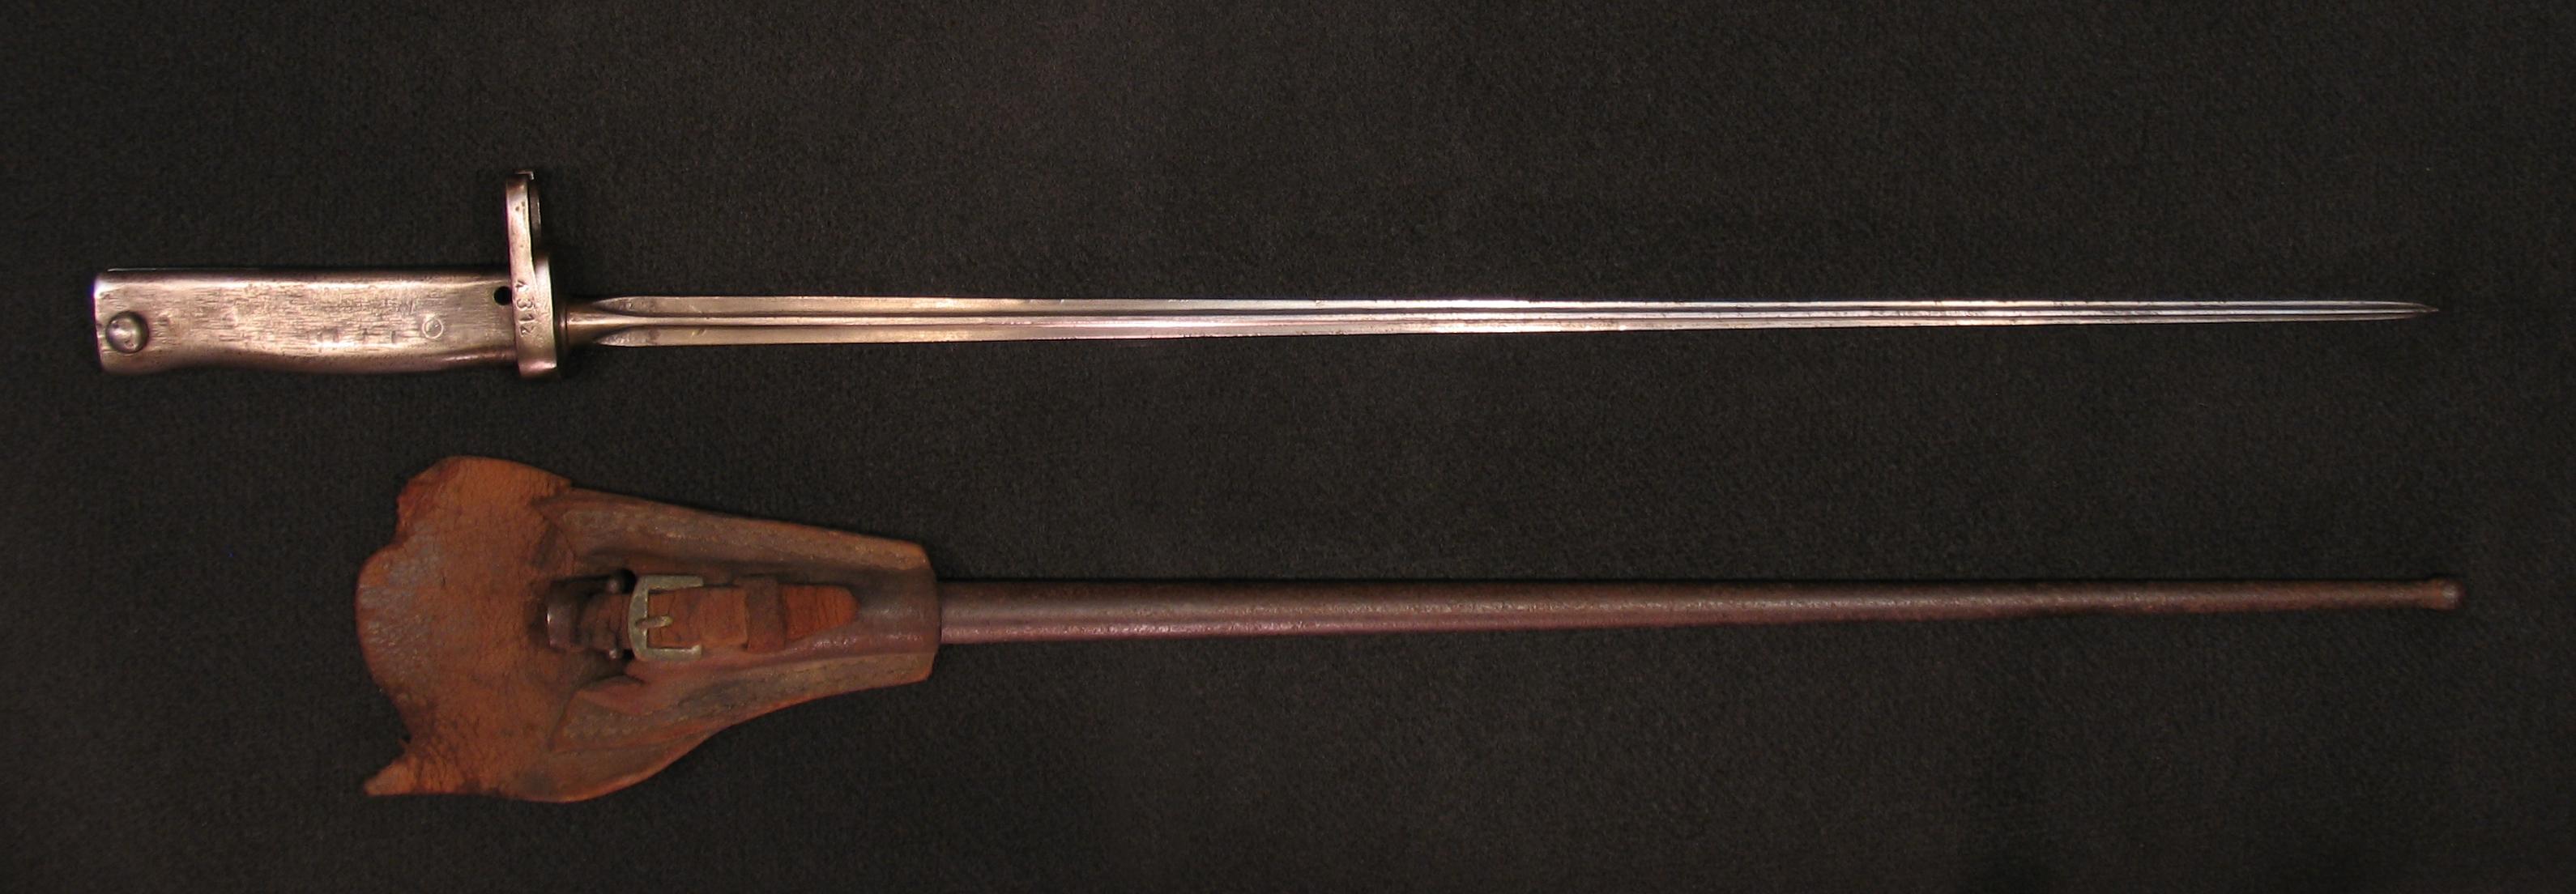 Click image for larger version.  Name:German ersatz Bayonets w Mle 86 Lebel Blade Detail 003.jpg Views:3 Size:2.00 MB ID:3667195